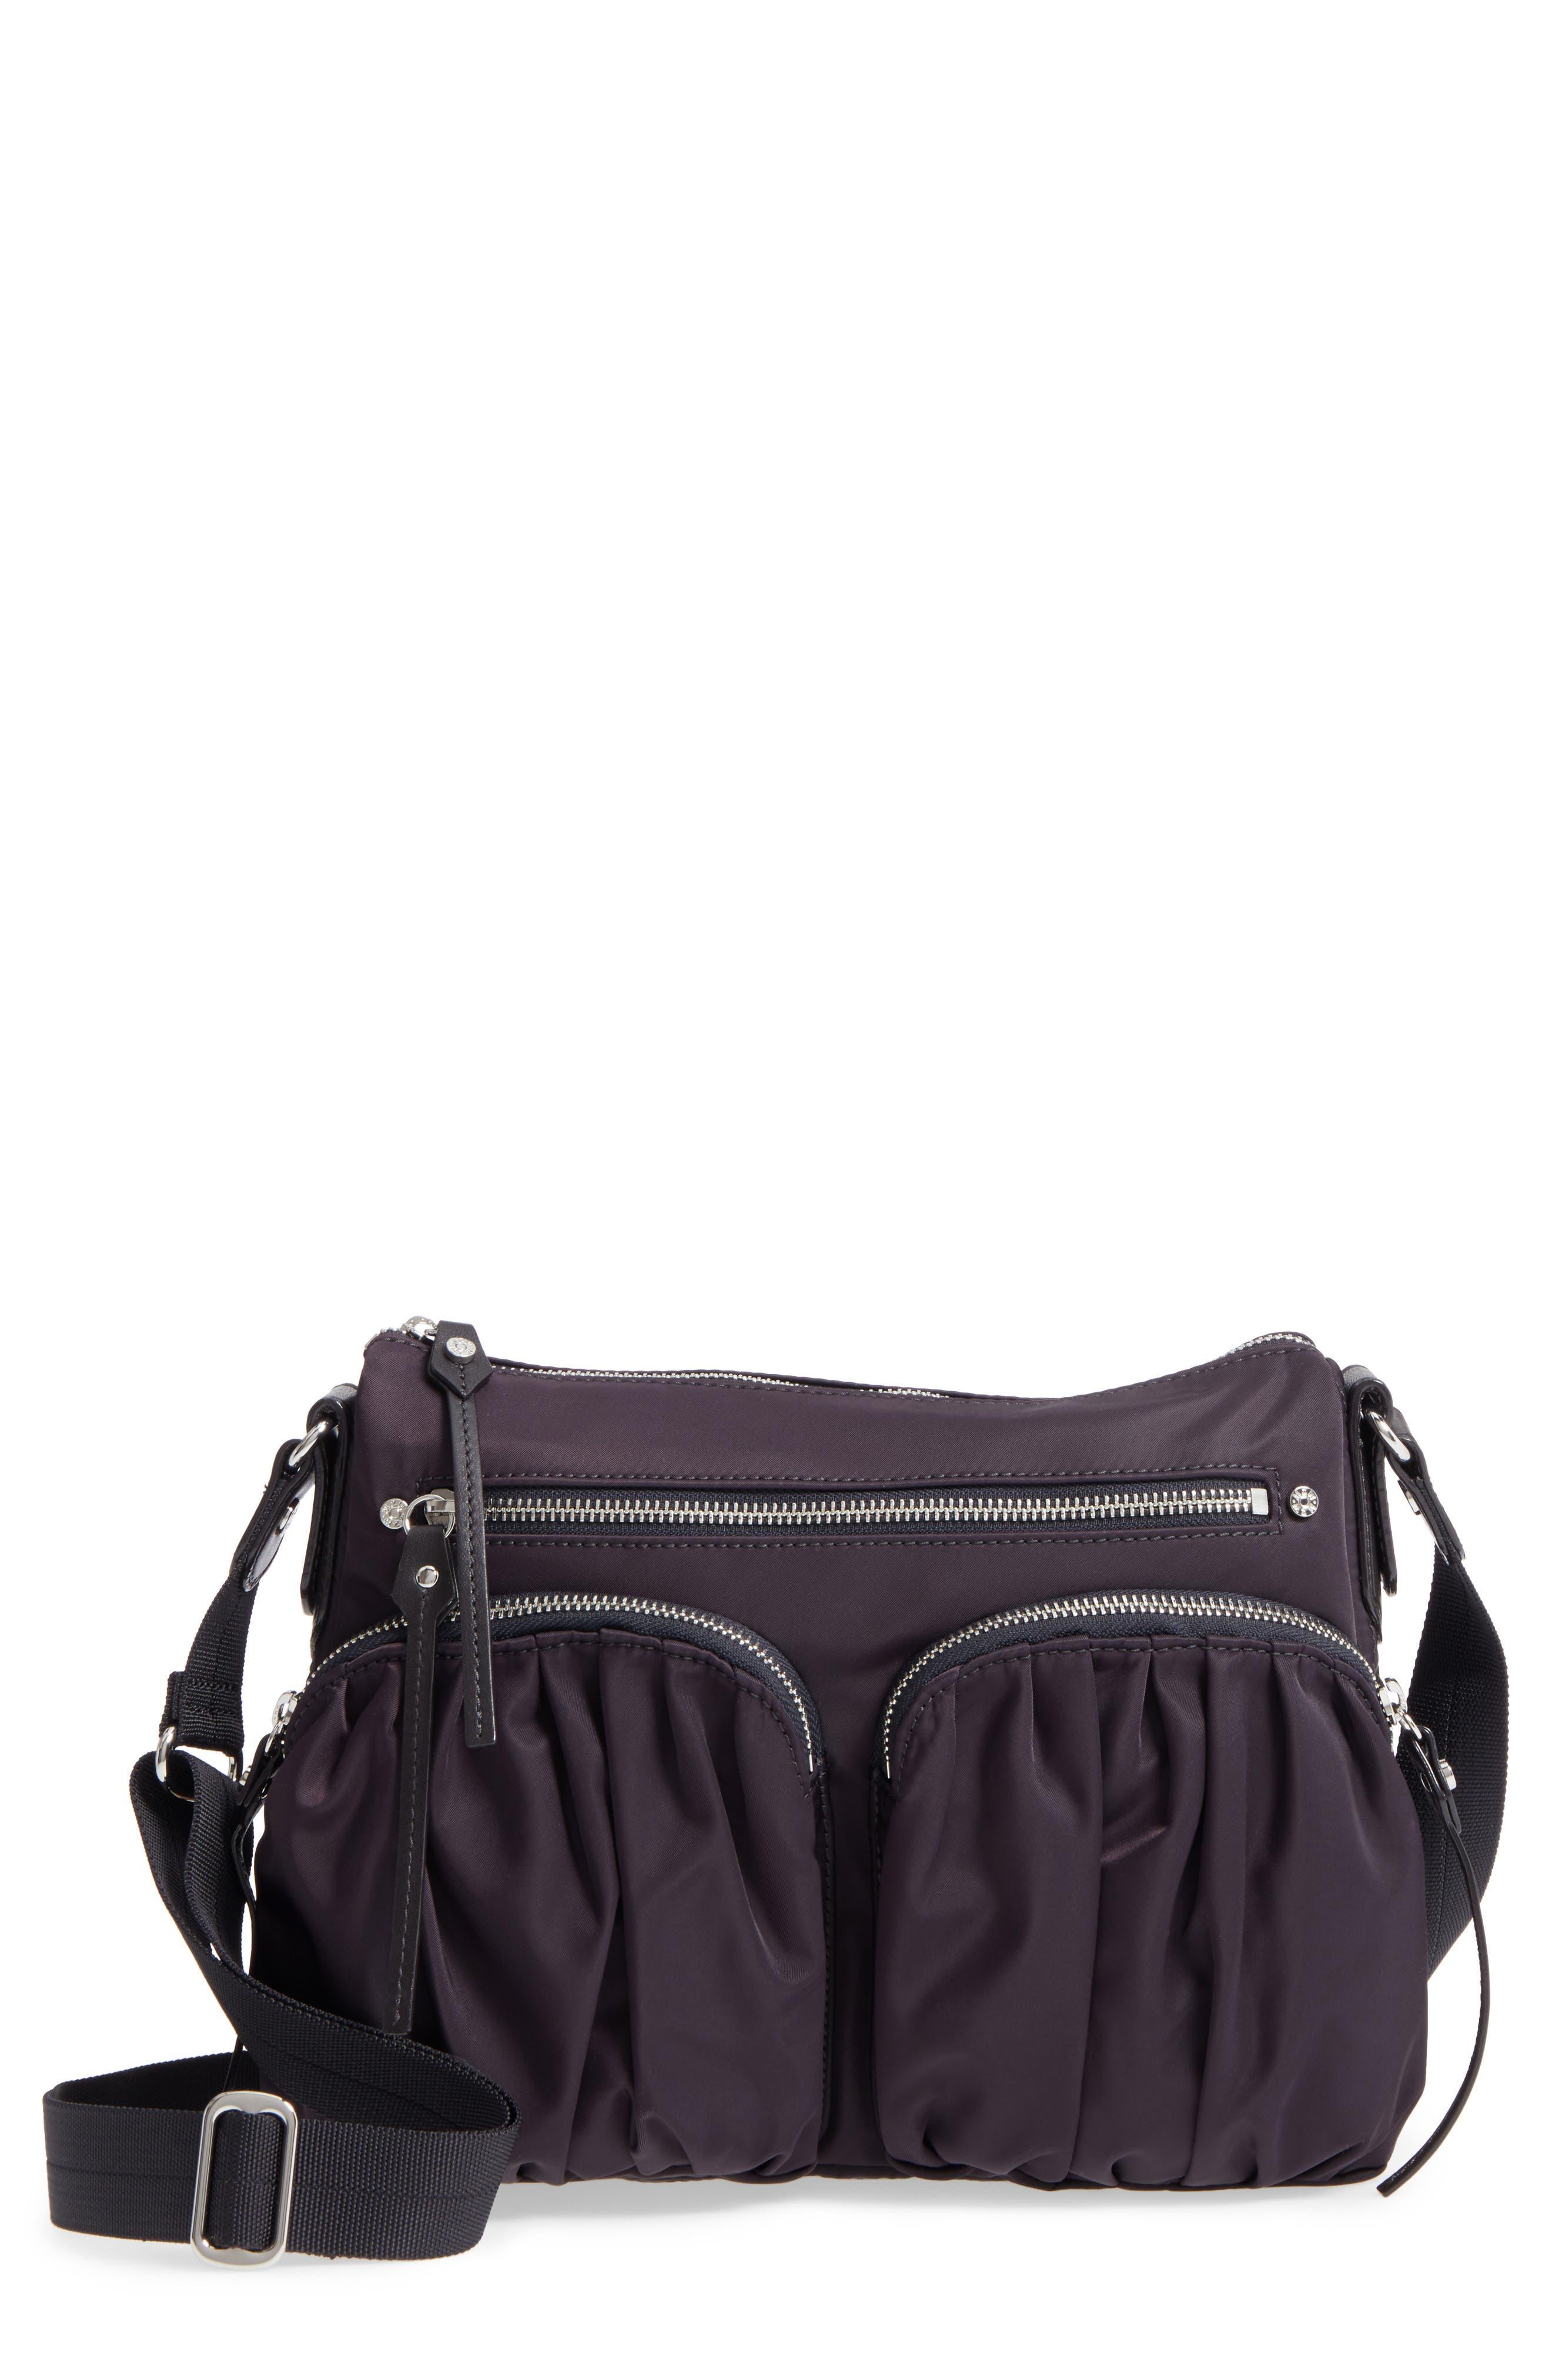 Alternate Image 1 Selected - MZ Wallace 'Paige' Bedford Nylon Crossbody Bag